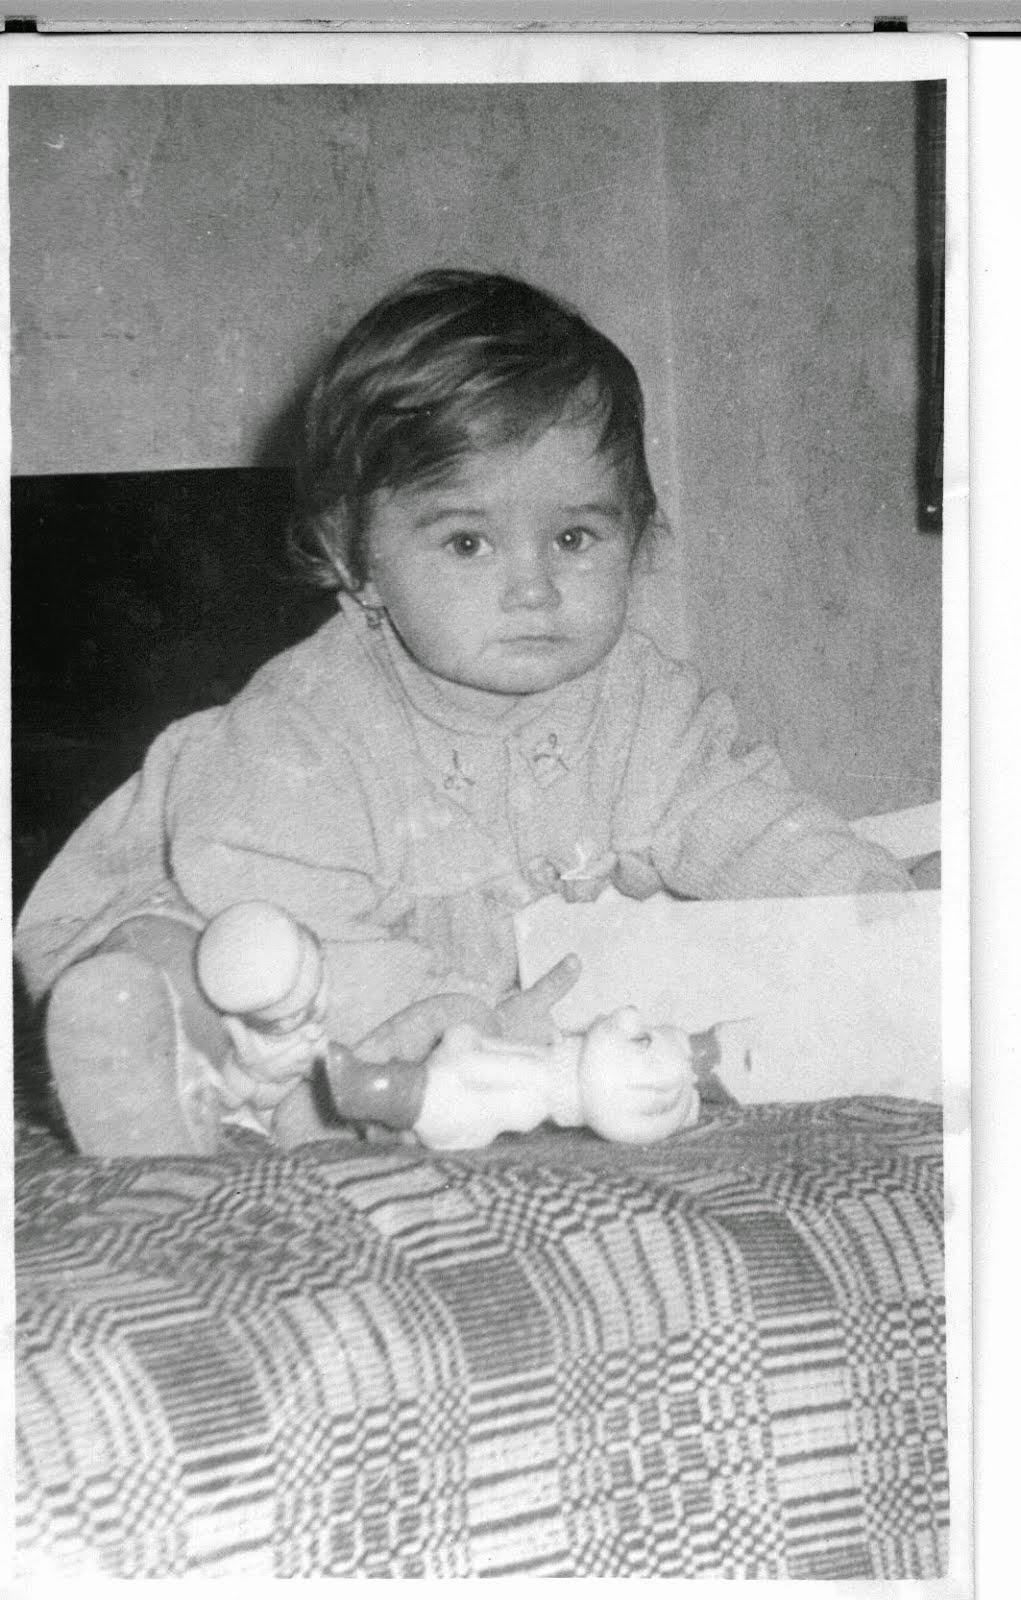 Olivia Maria Marcov 1968 1969 in Str Sebastian Bucharest Romania la bunica mea Jeana Mardale